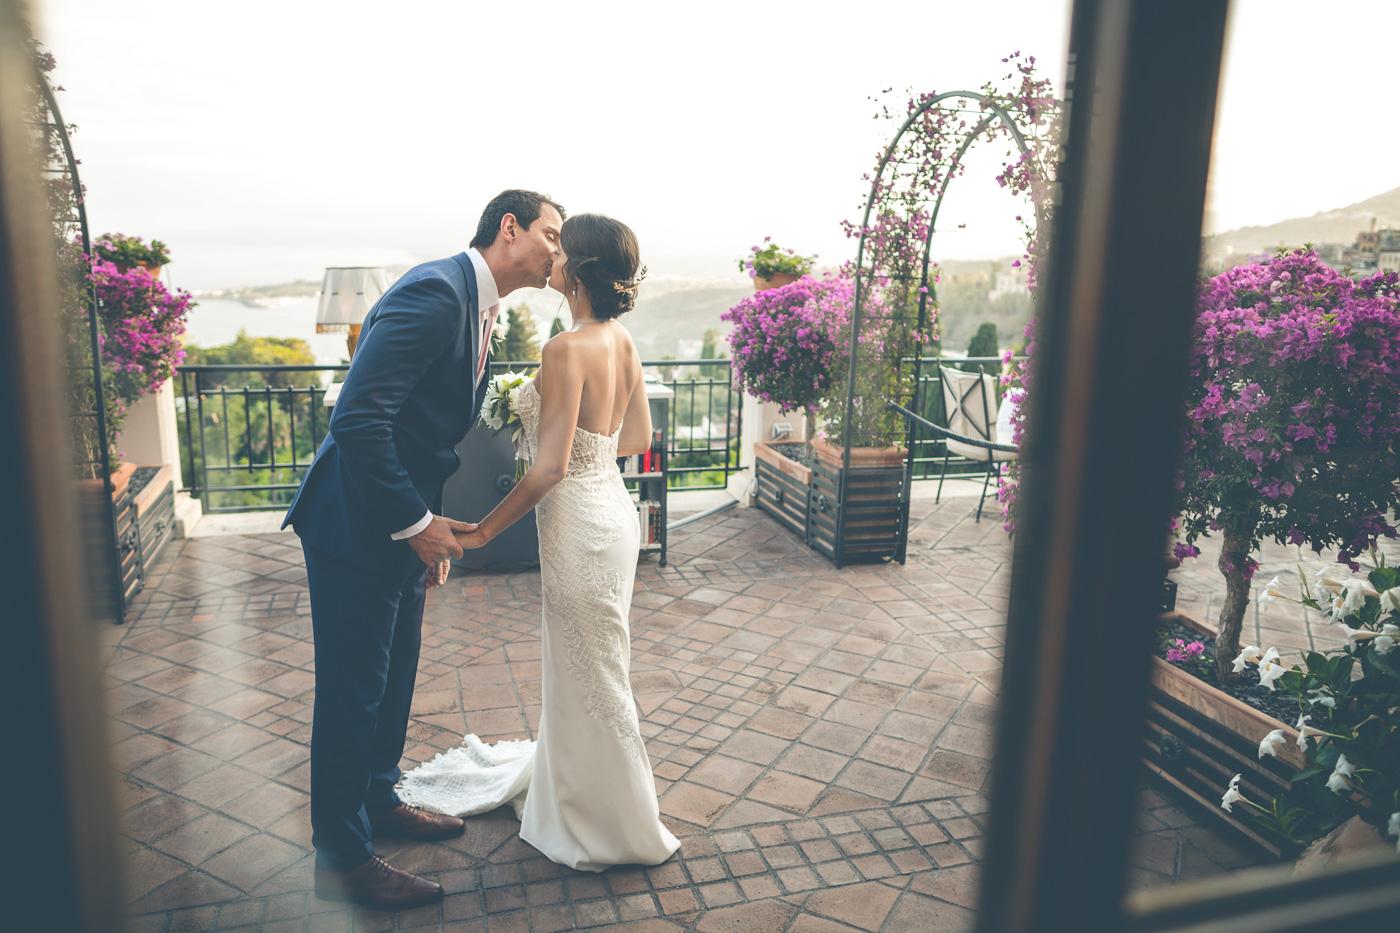 Matrimonio Irlandese Taormina_fotografo_matrimonio_migliore_bravo_timeo_belmondTimeo